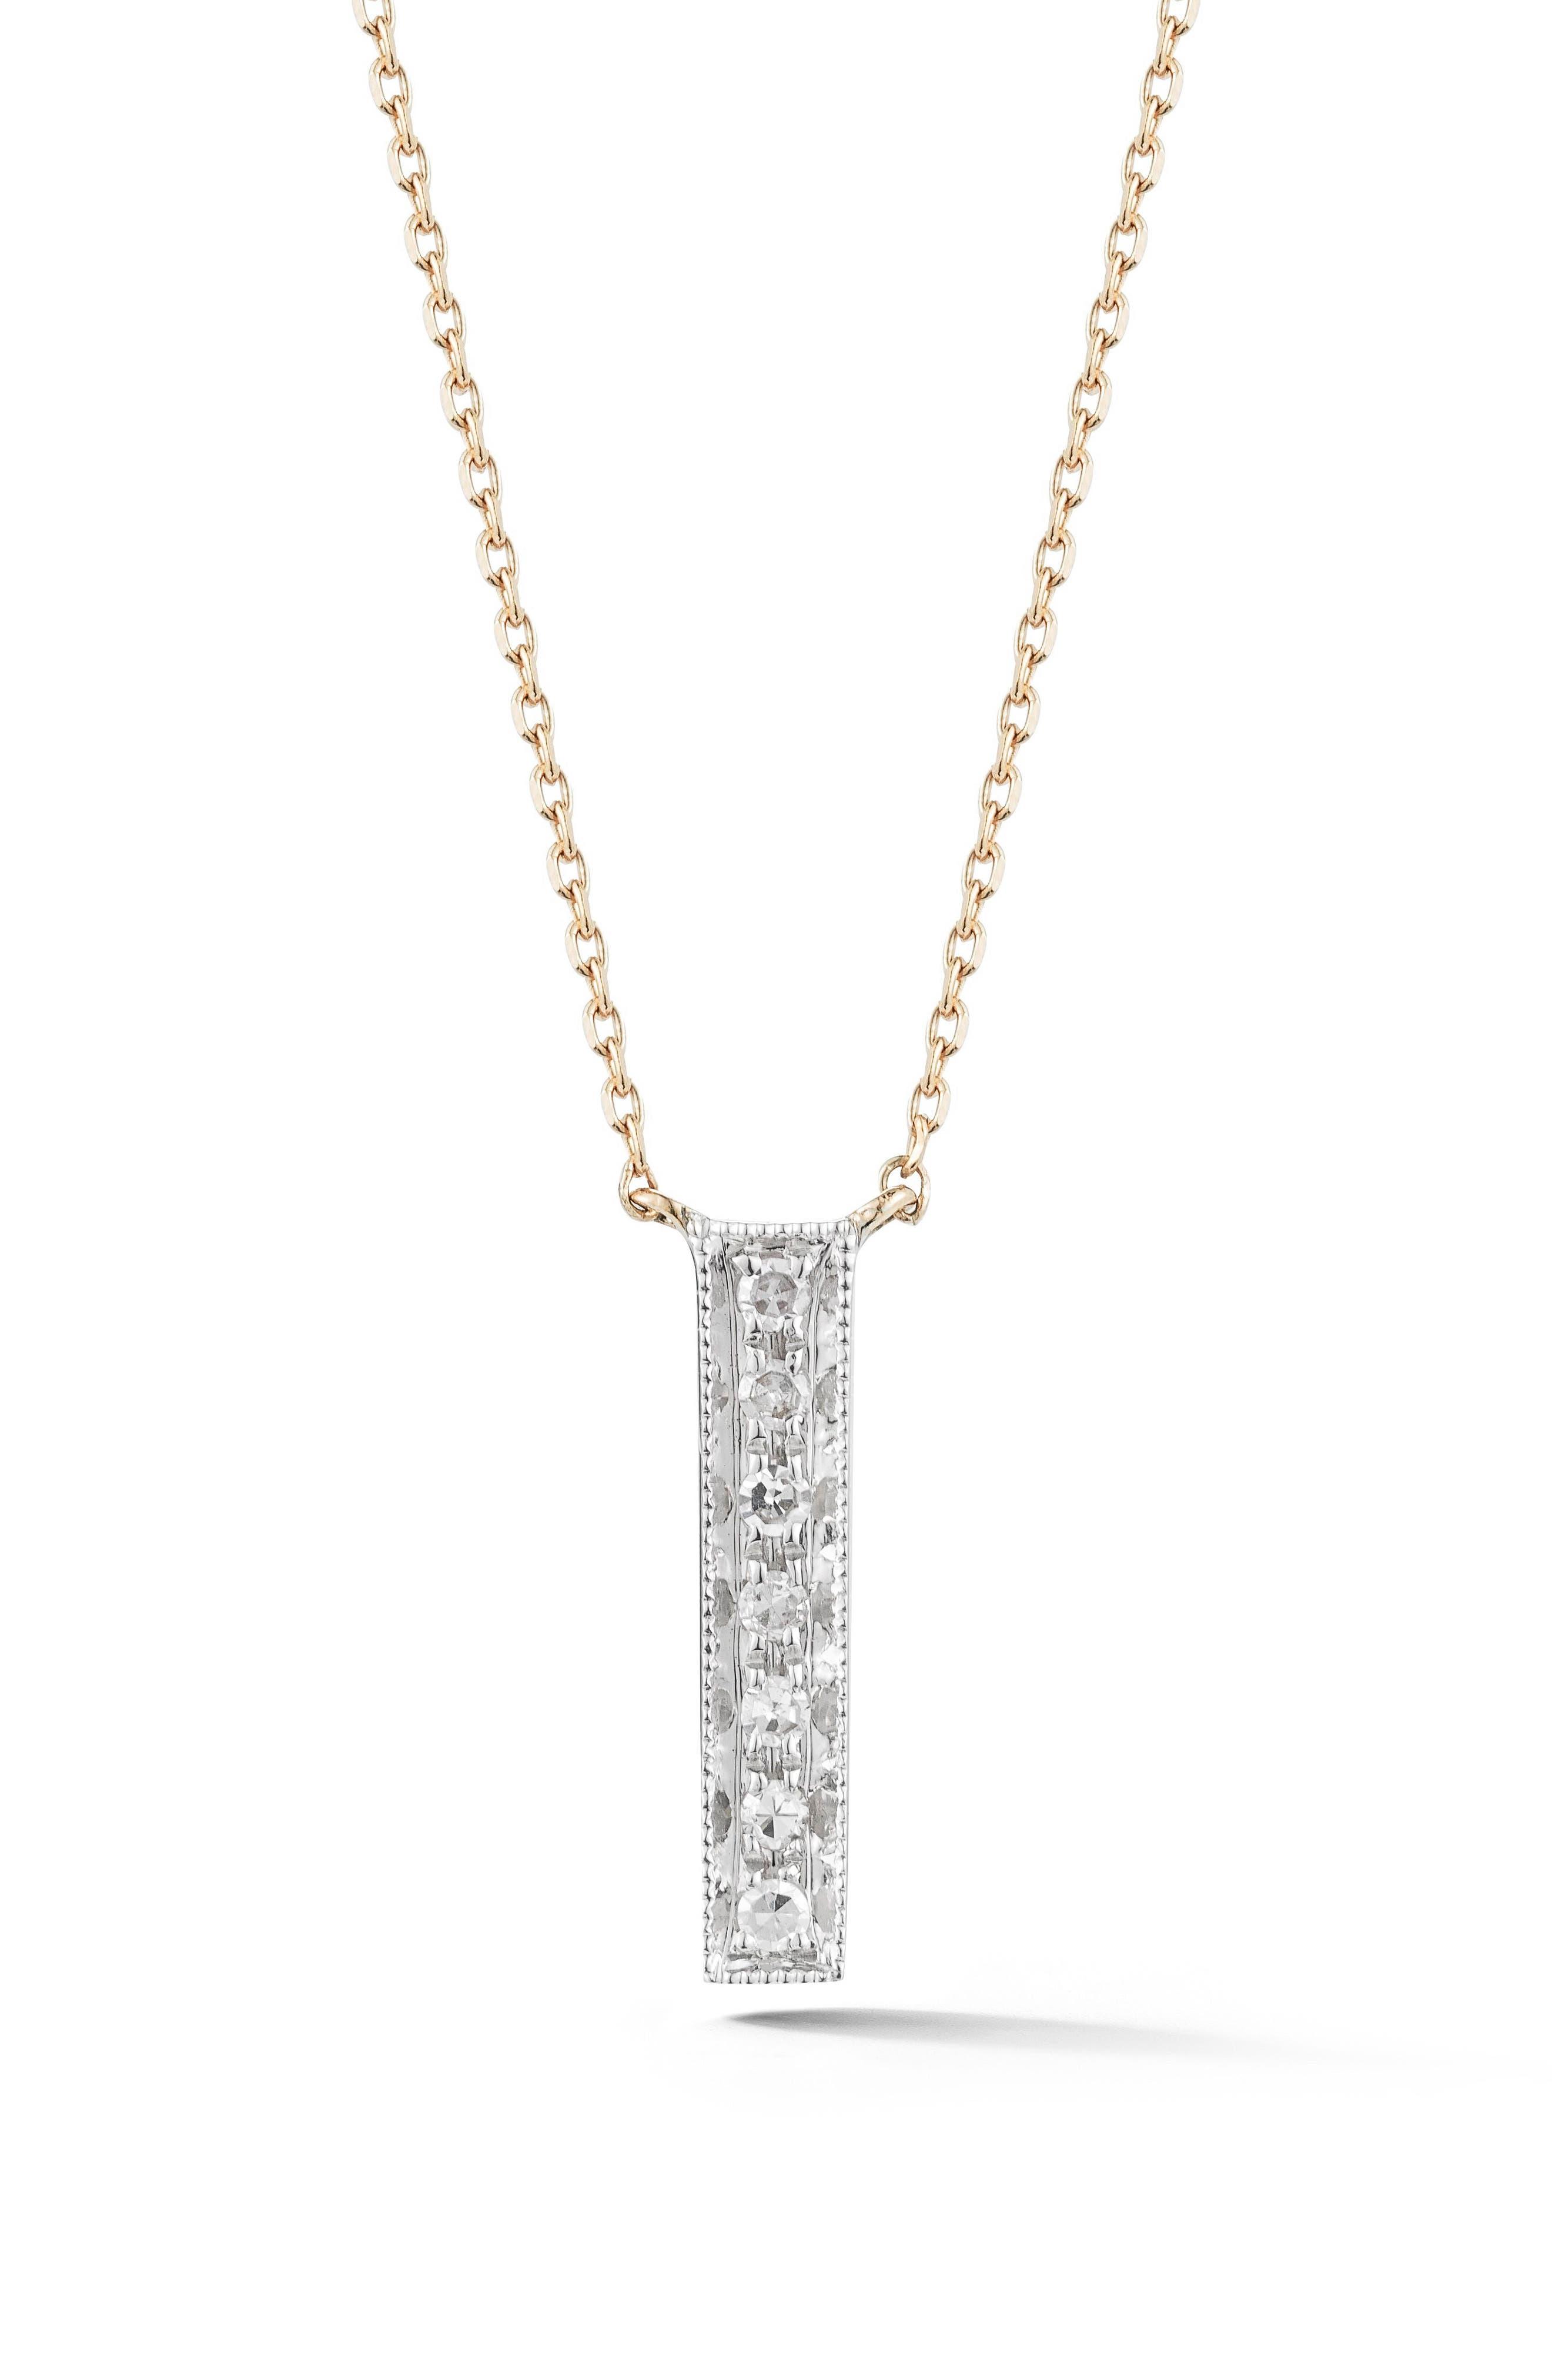 Sylvie Rose Vertical Bar Diamond Pendant Necklace,                             Main thumbnail 1, color,                             YELLOW GOLD